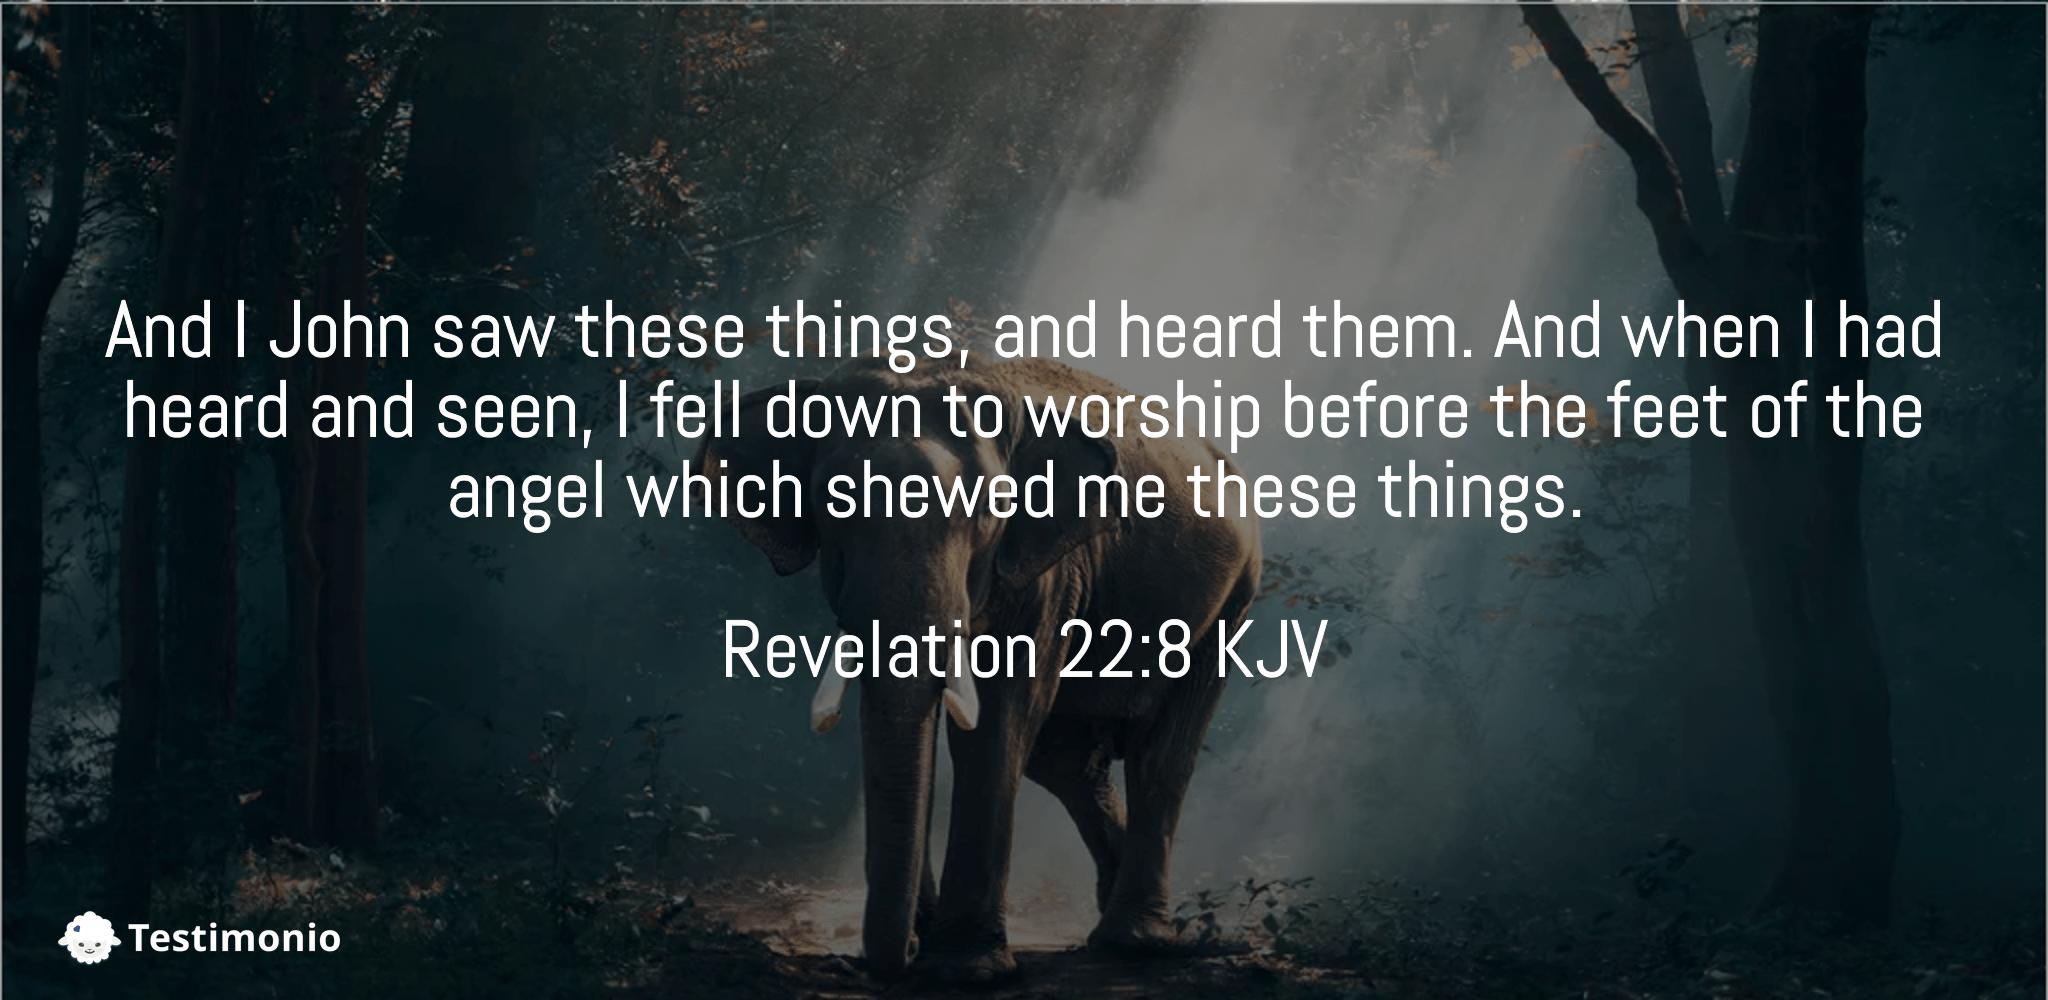 Revelation 22:8